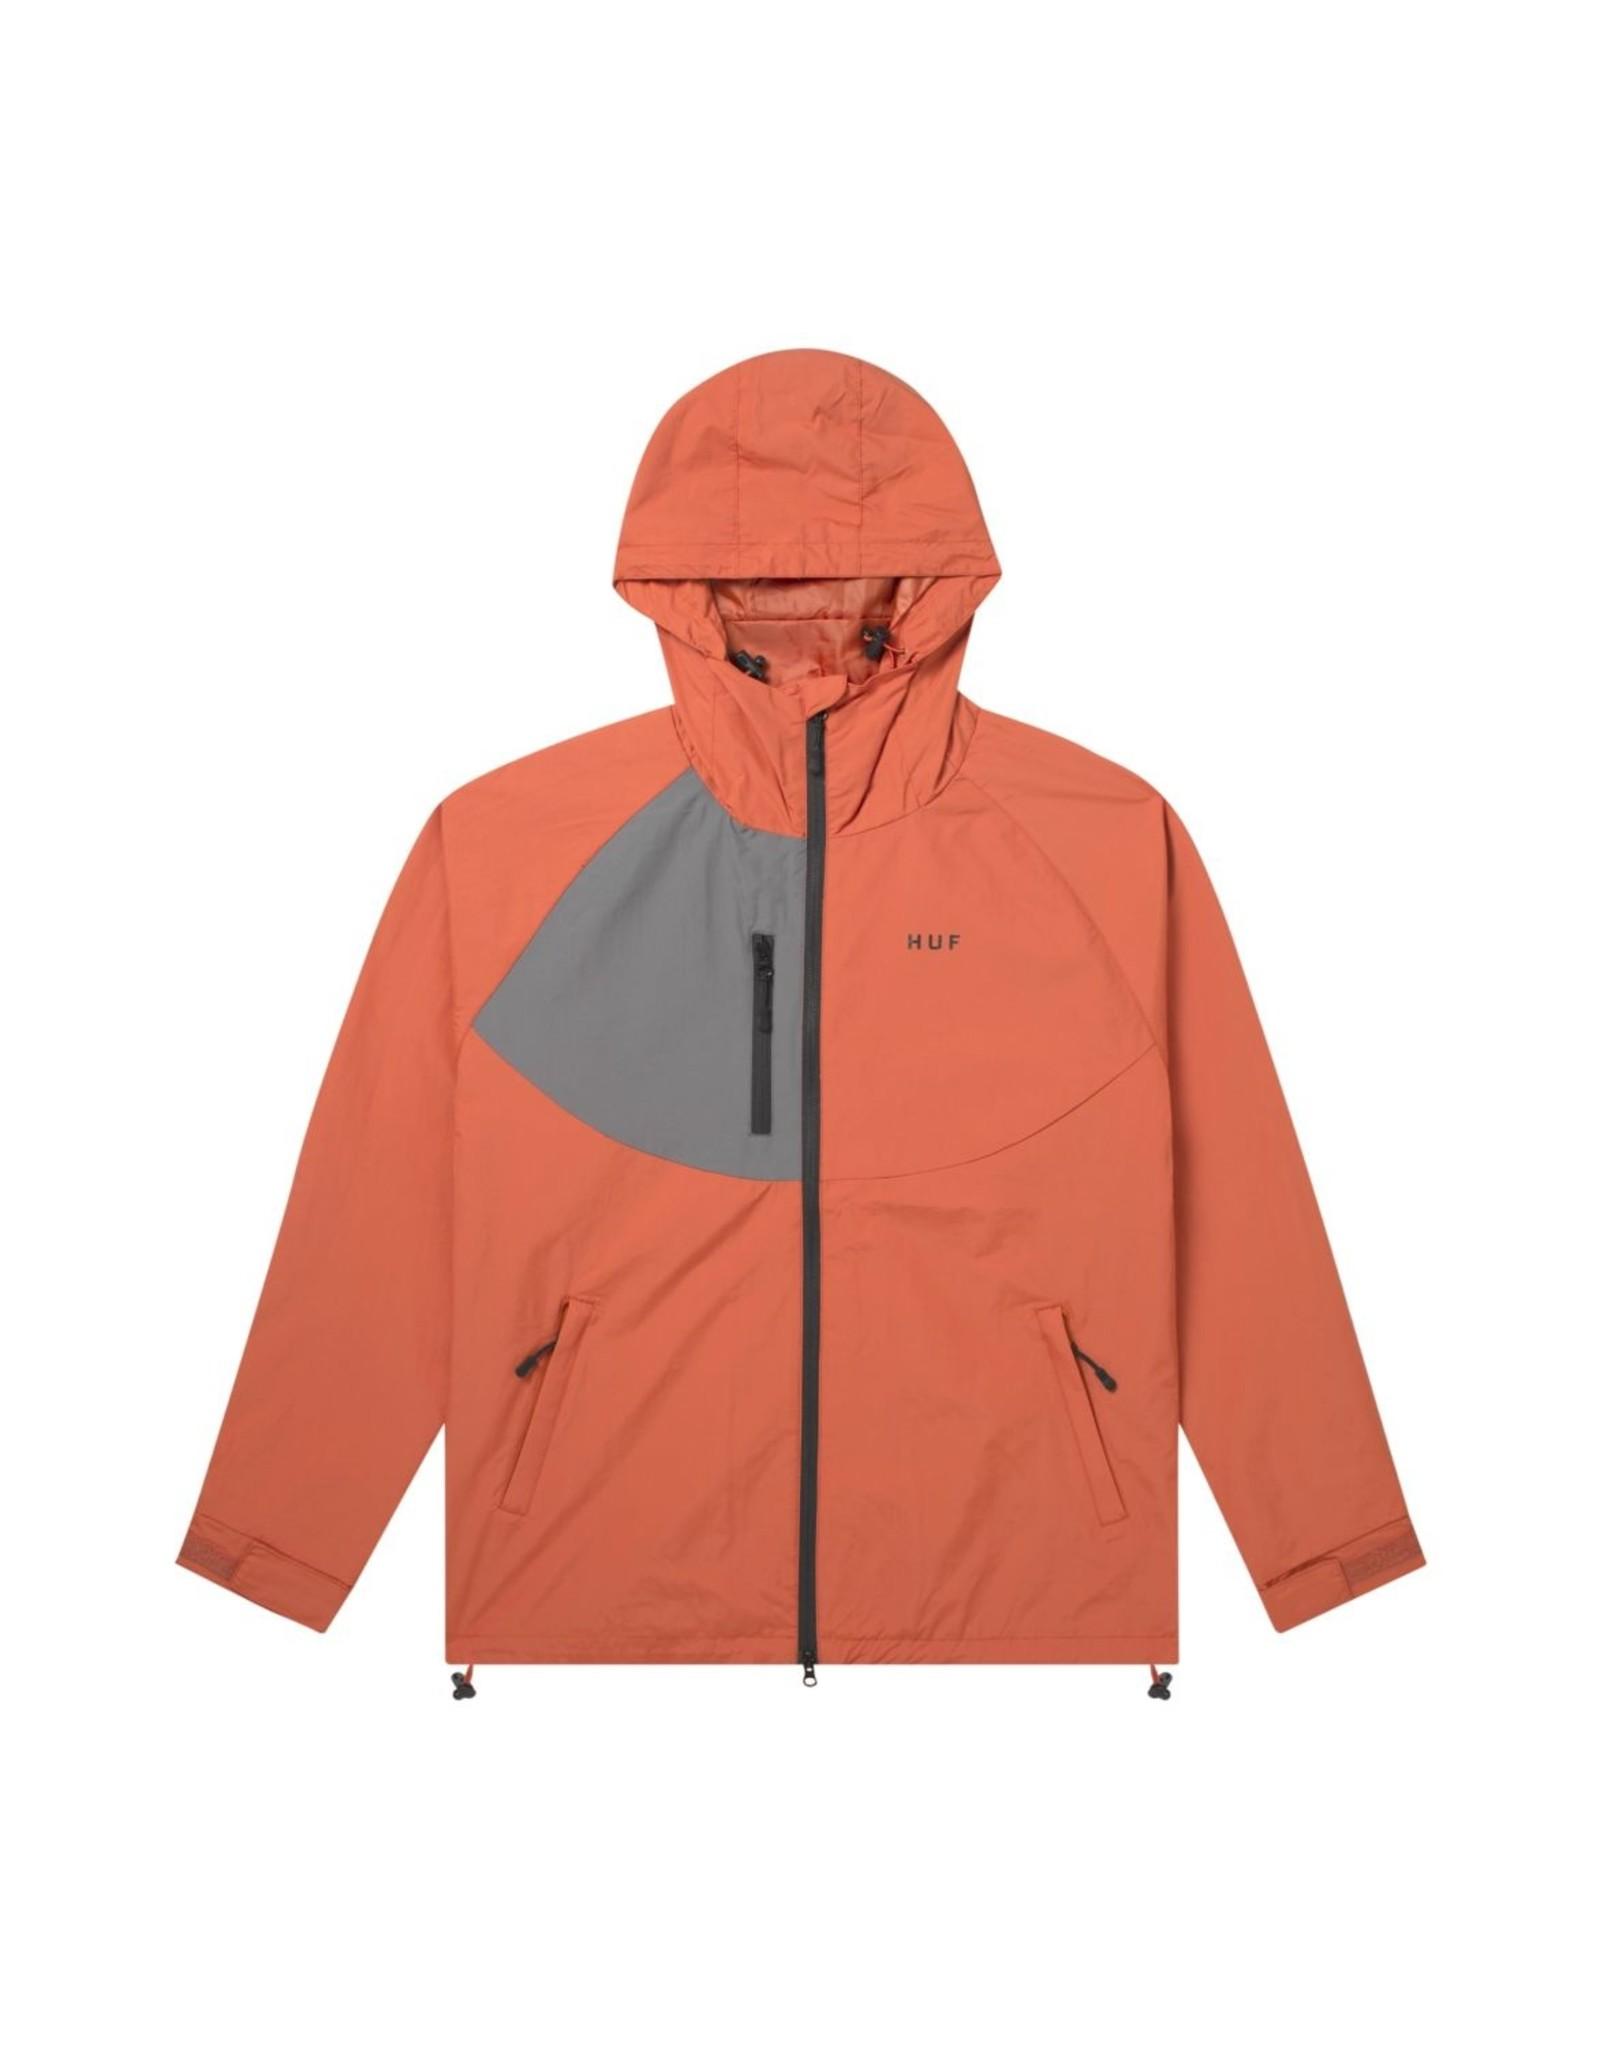 HUF Shell Standard 2 Jacket HUF Rust